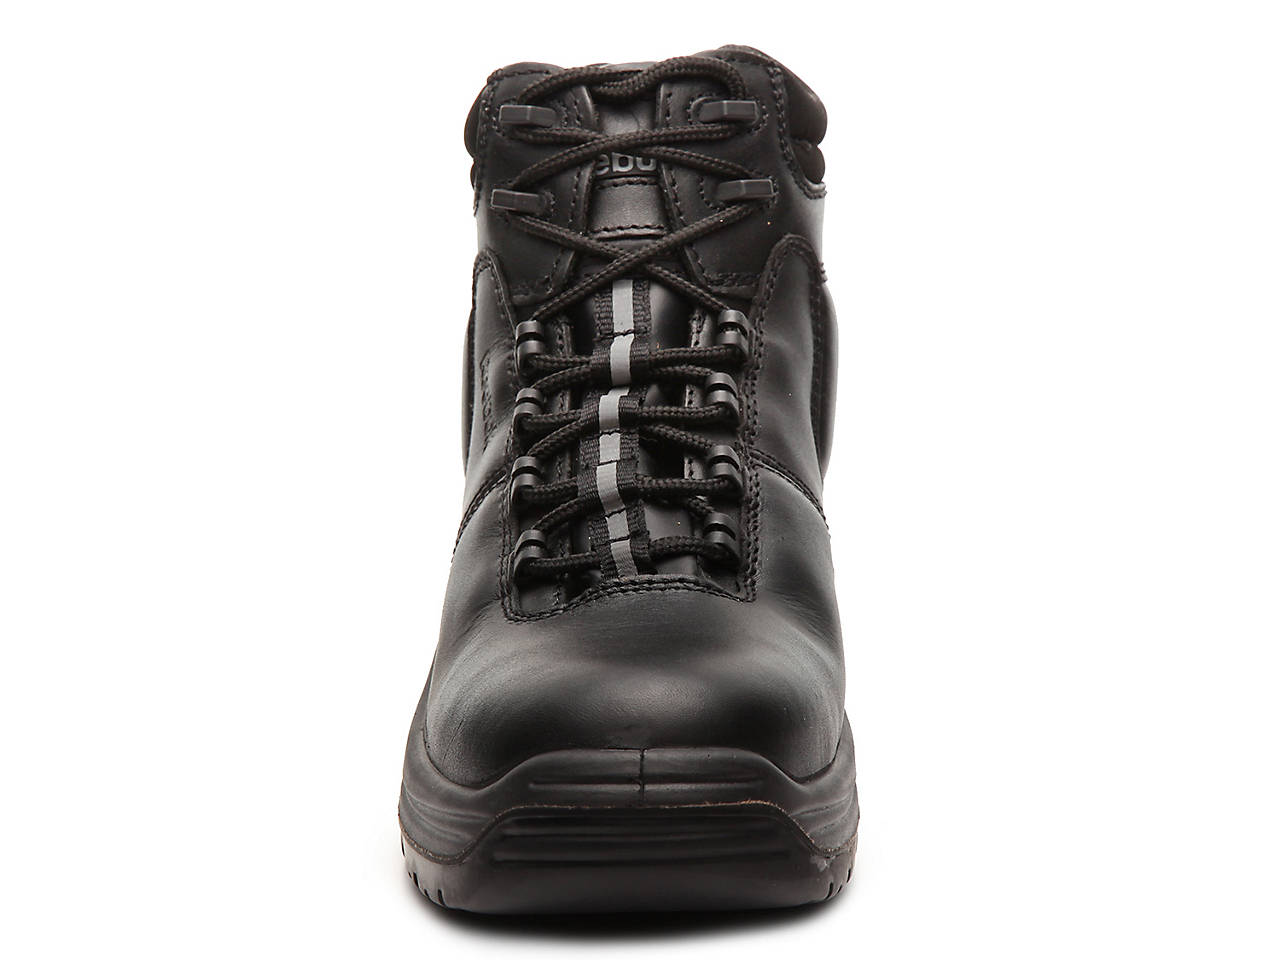 85be35387d7b Reebok Trainex Composite Toe Work Boot Men s Shoes